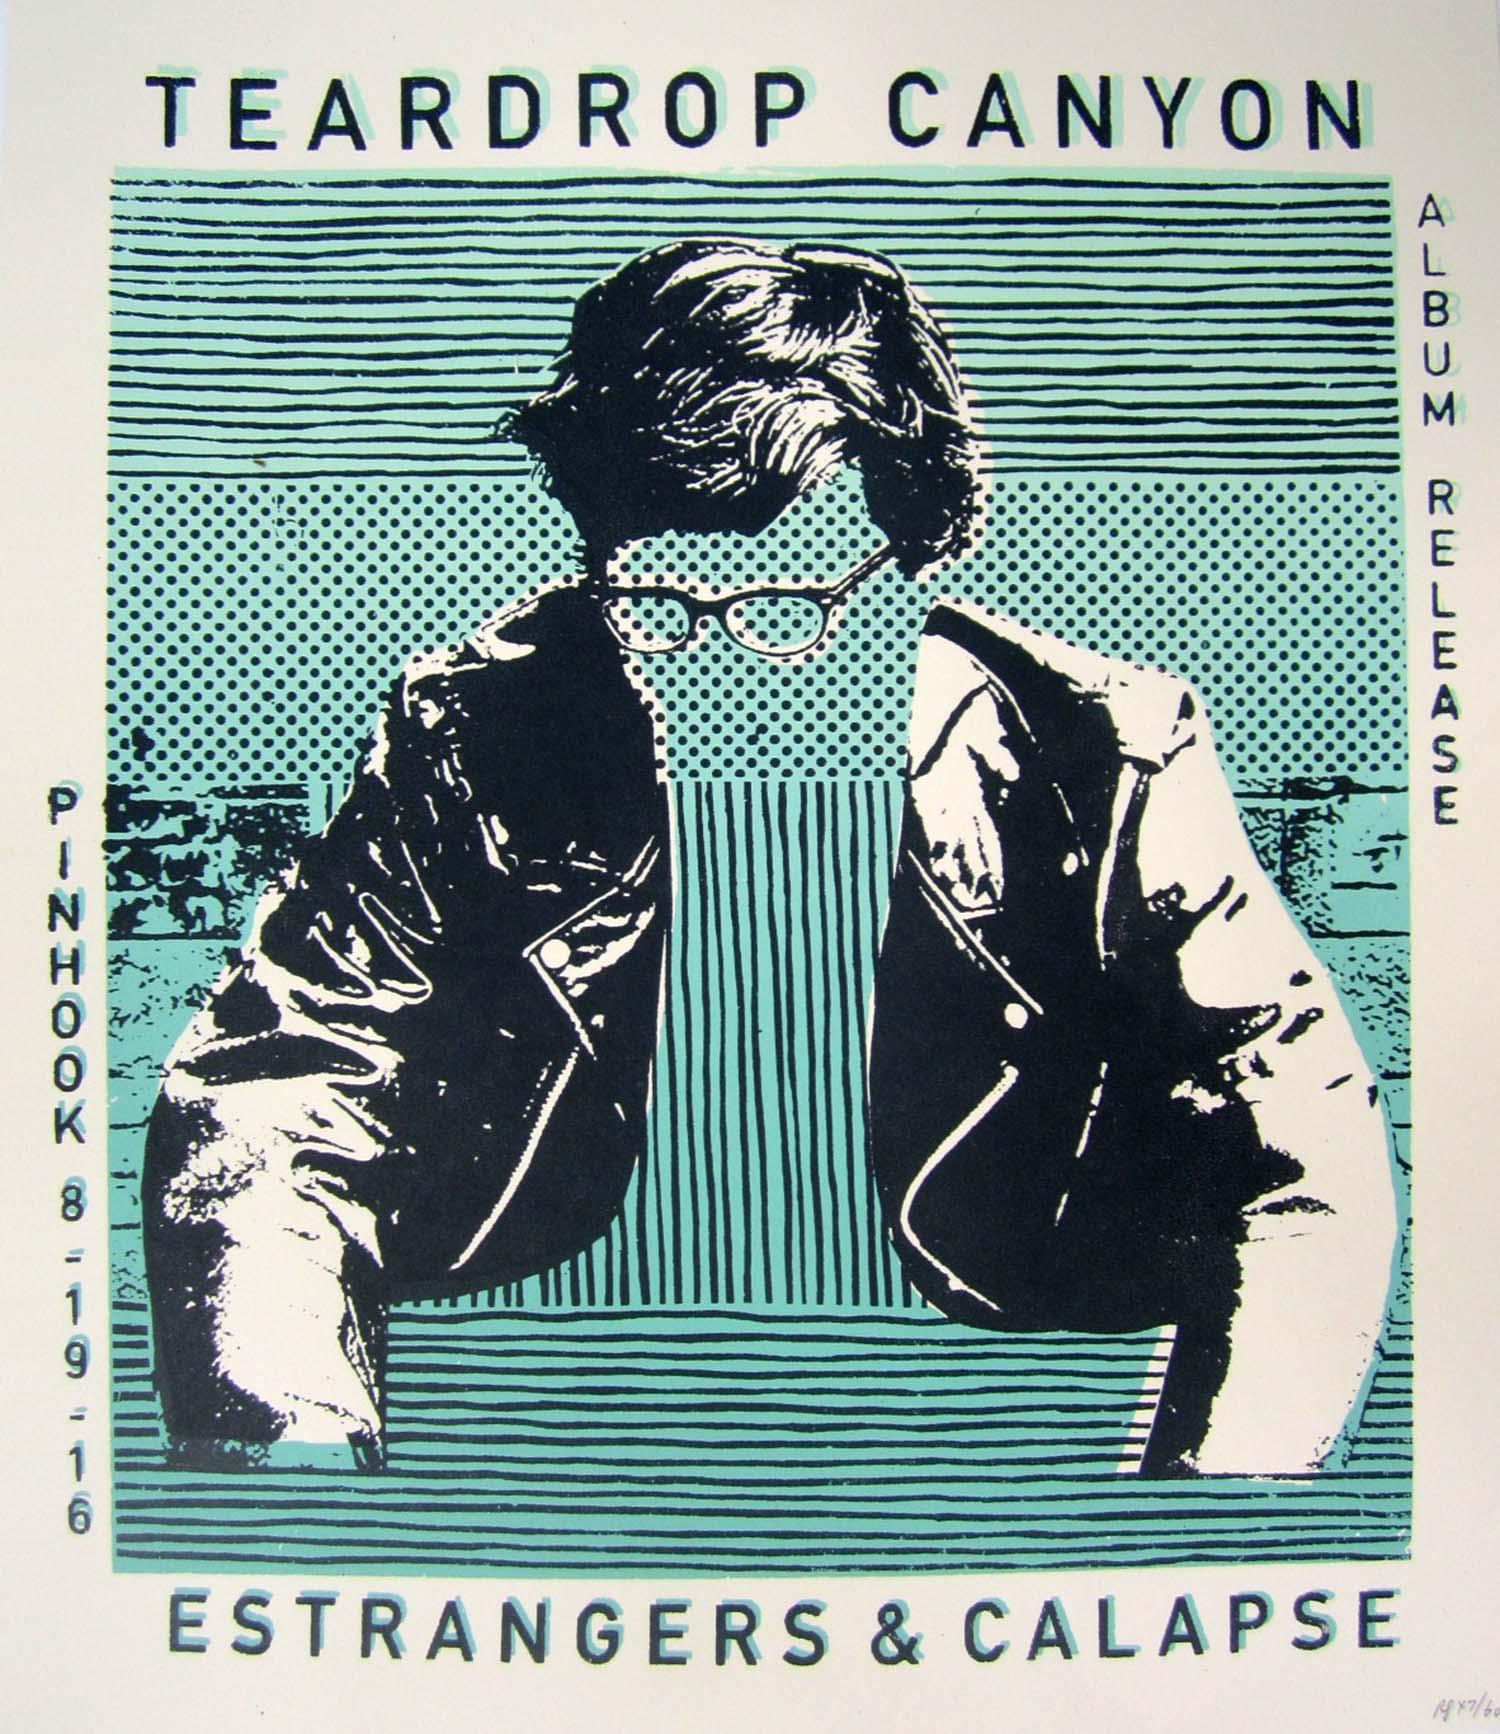 Teardrop Canyon - Estrangers & Calapse